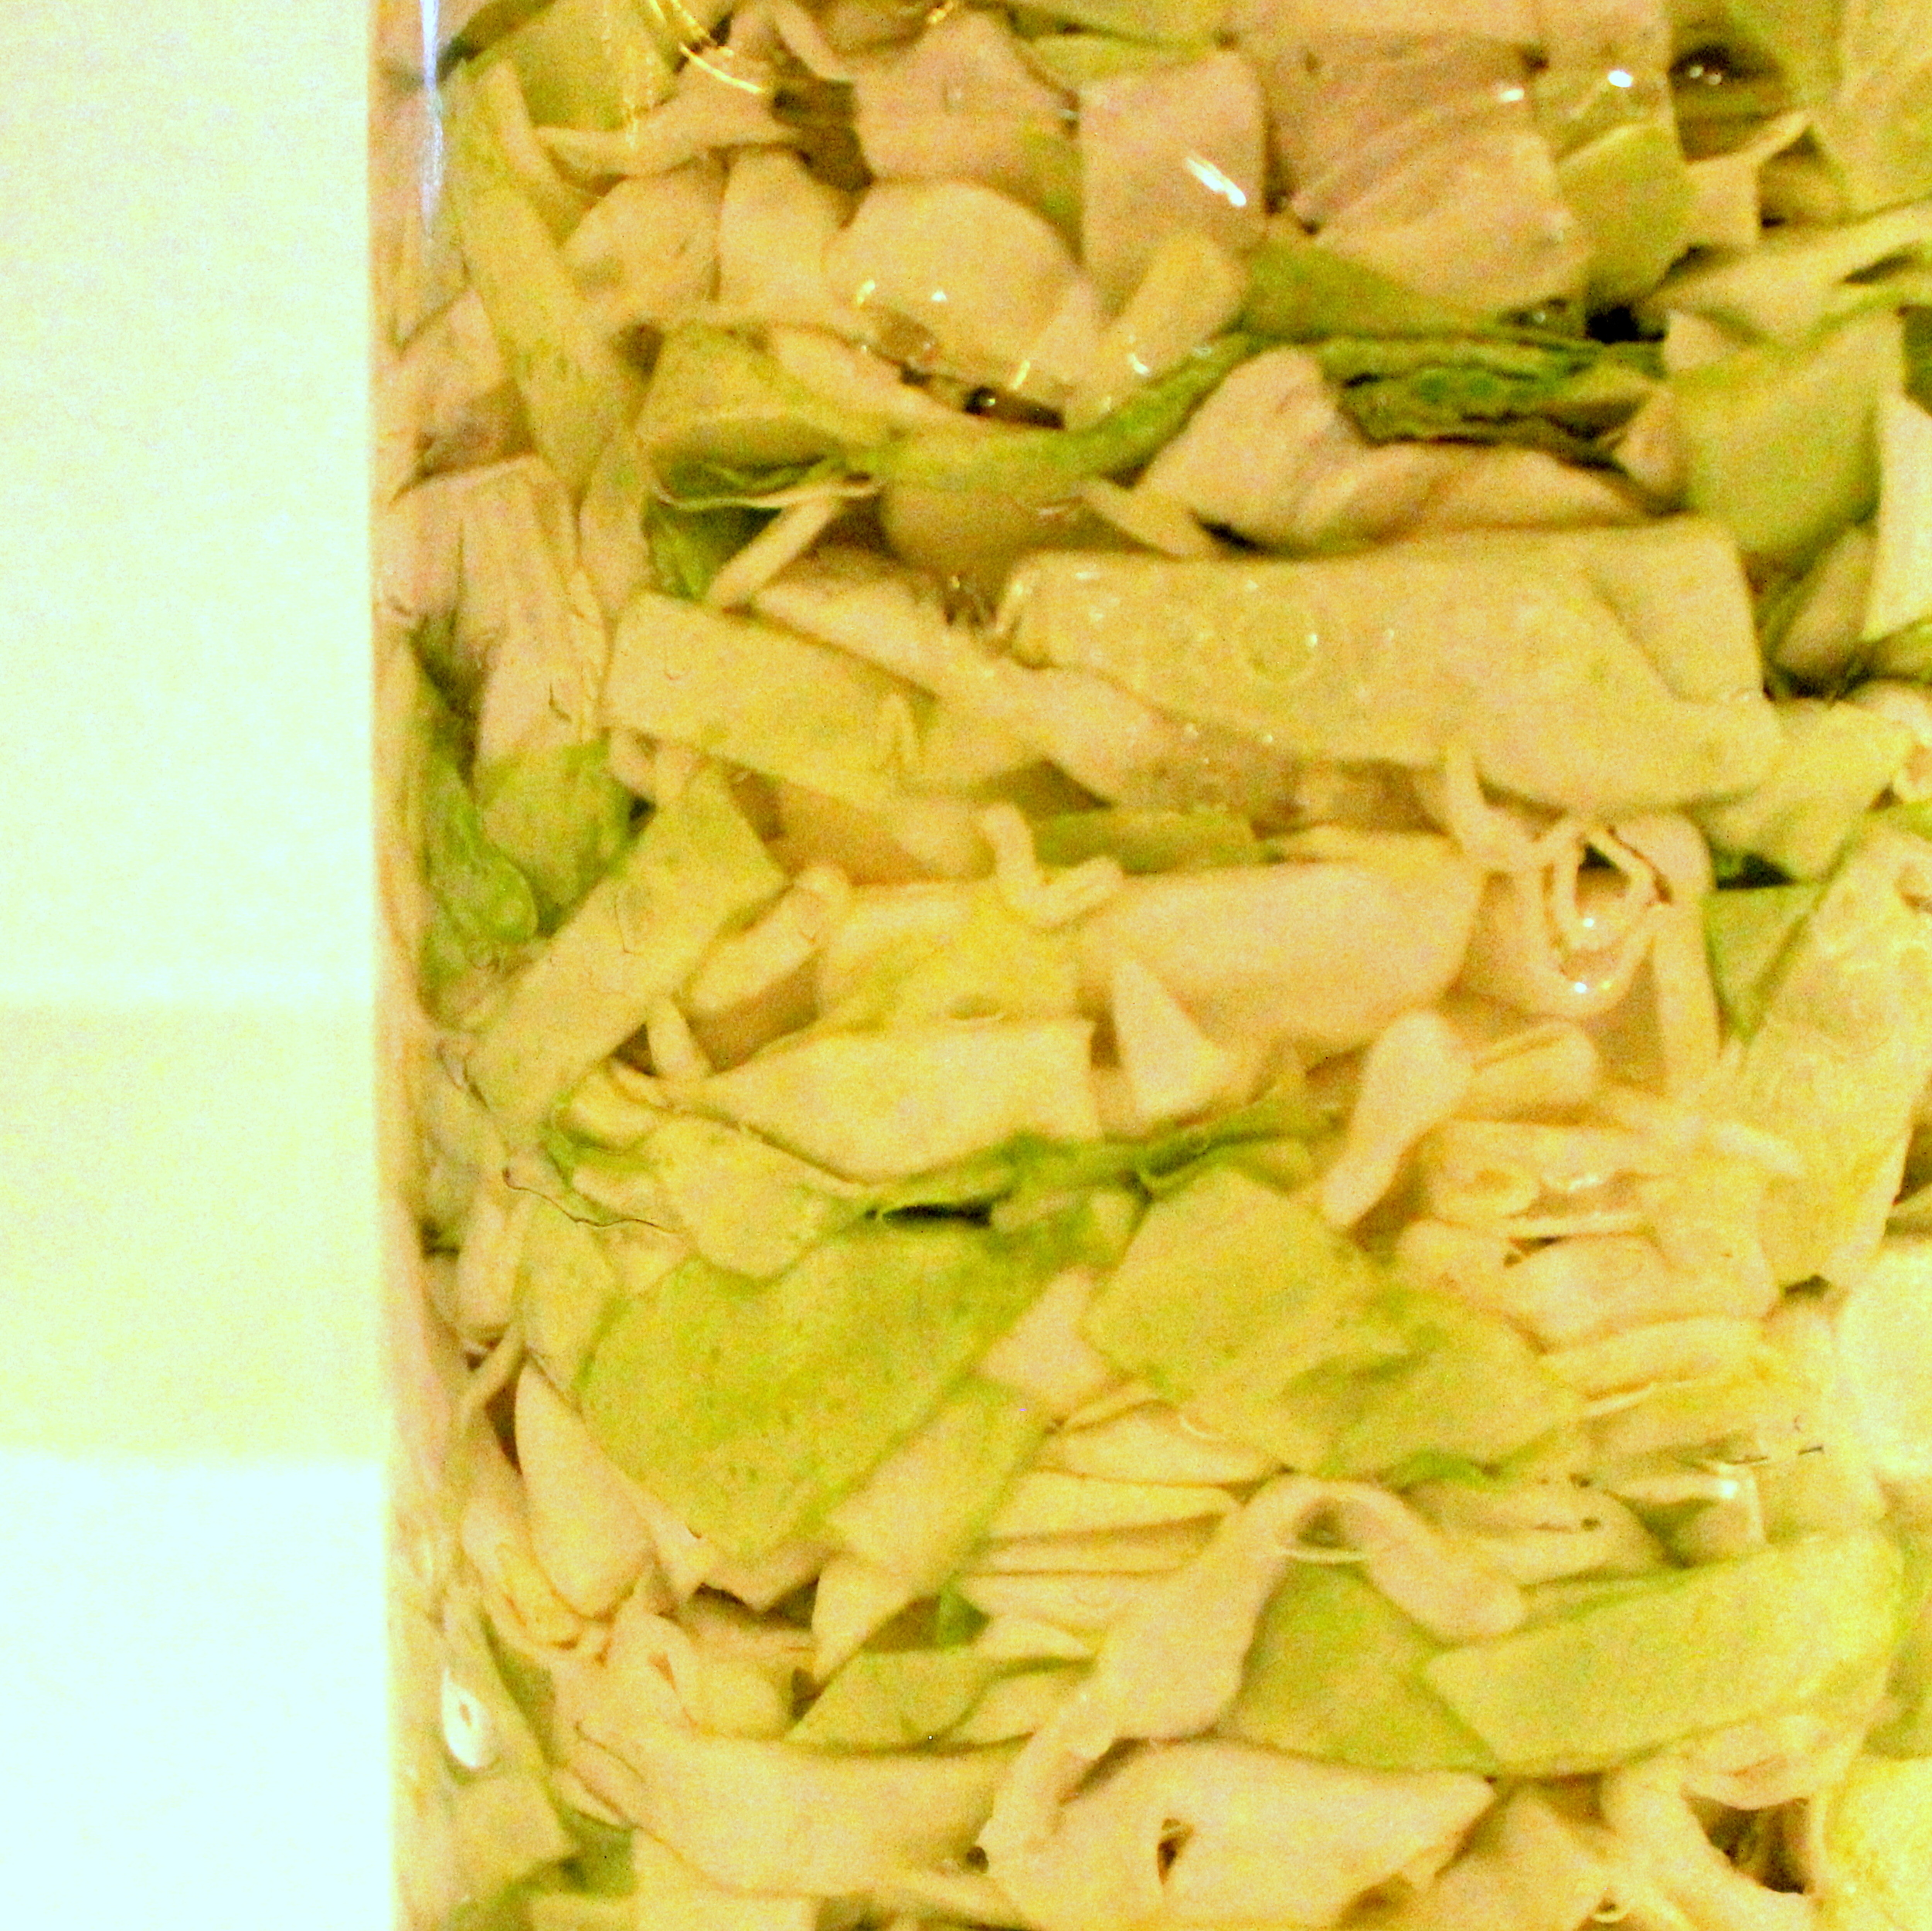 Homemade Sauerkraut and Probiotics from Peas and Hoppiness - www.peasandhoppiness.com